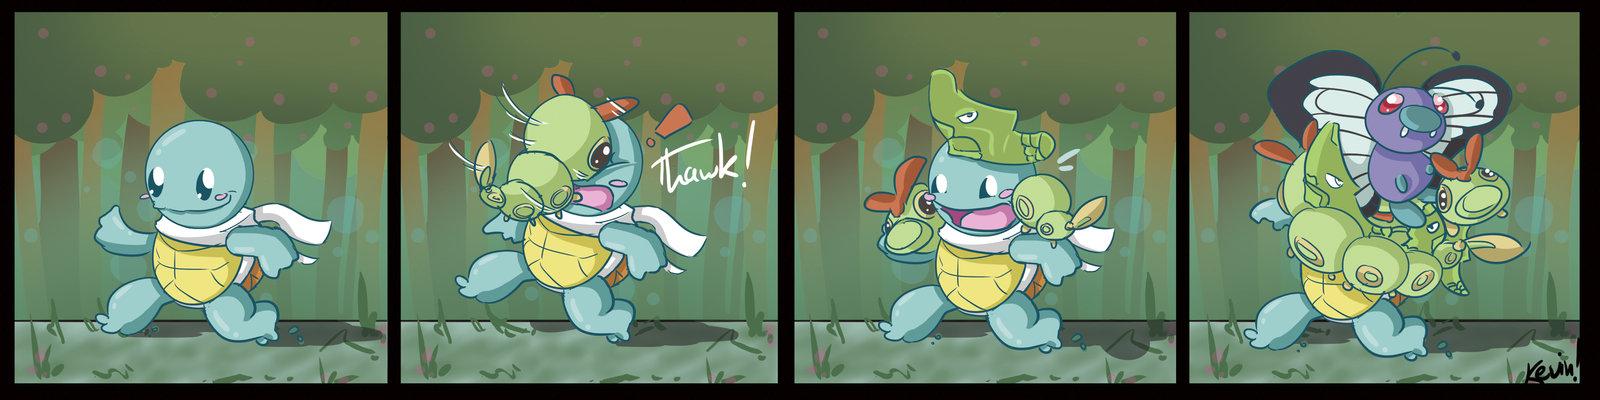 Fan Comics Pokemon Pokémon Squirtle Comics